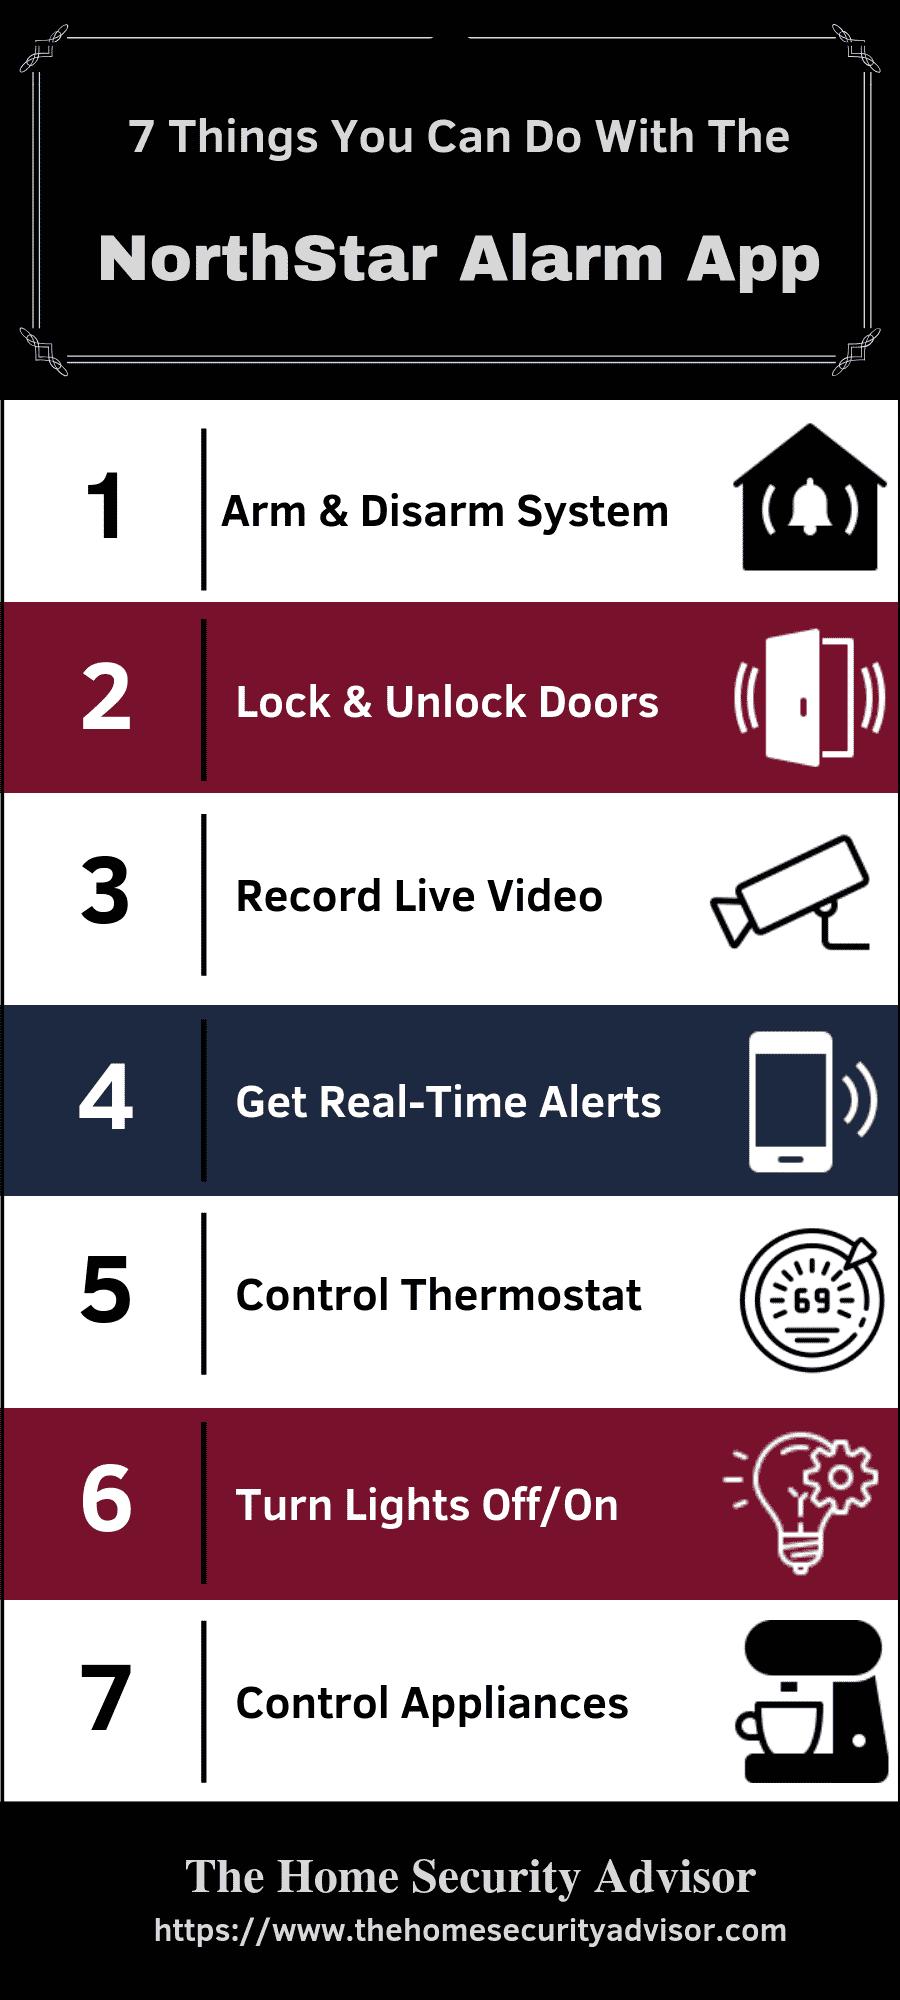 NorthStar Alarm Security APP